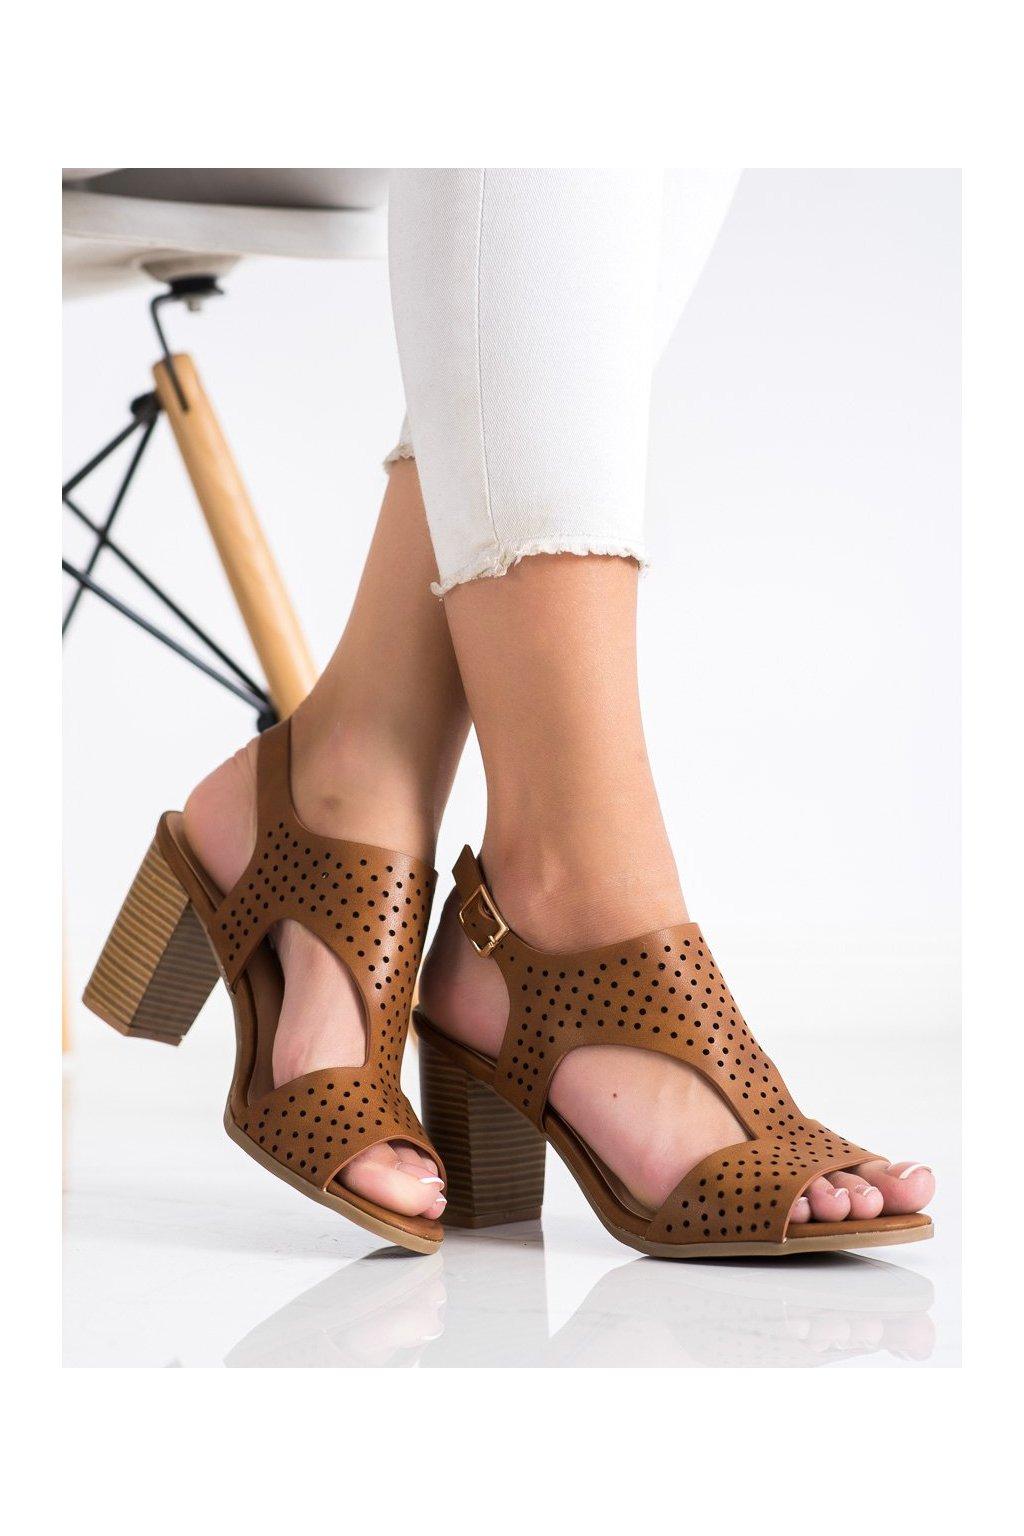 Hnedé dámske sandále Renda kod S-886C